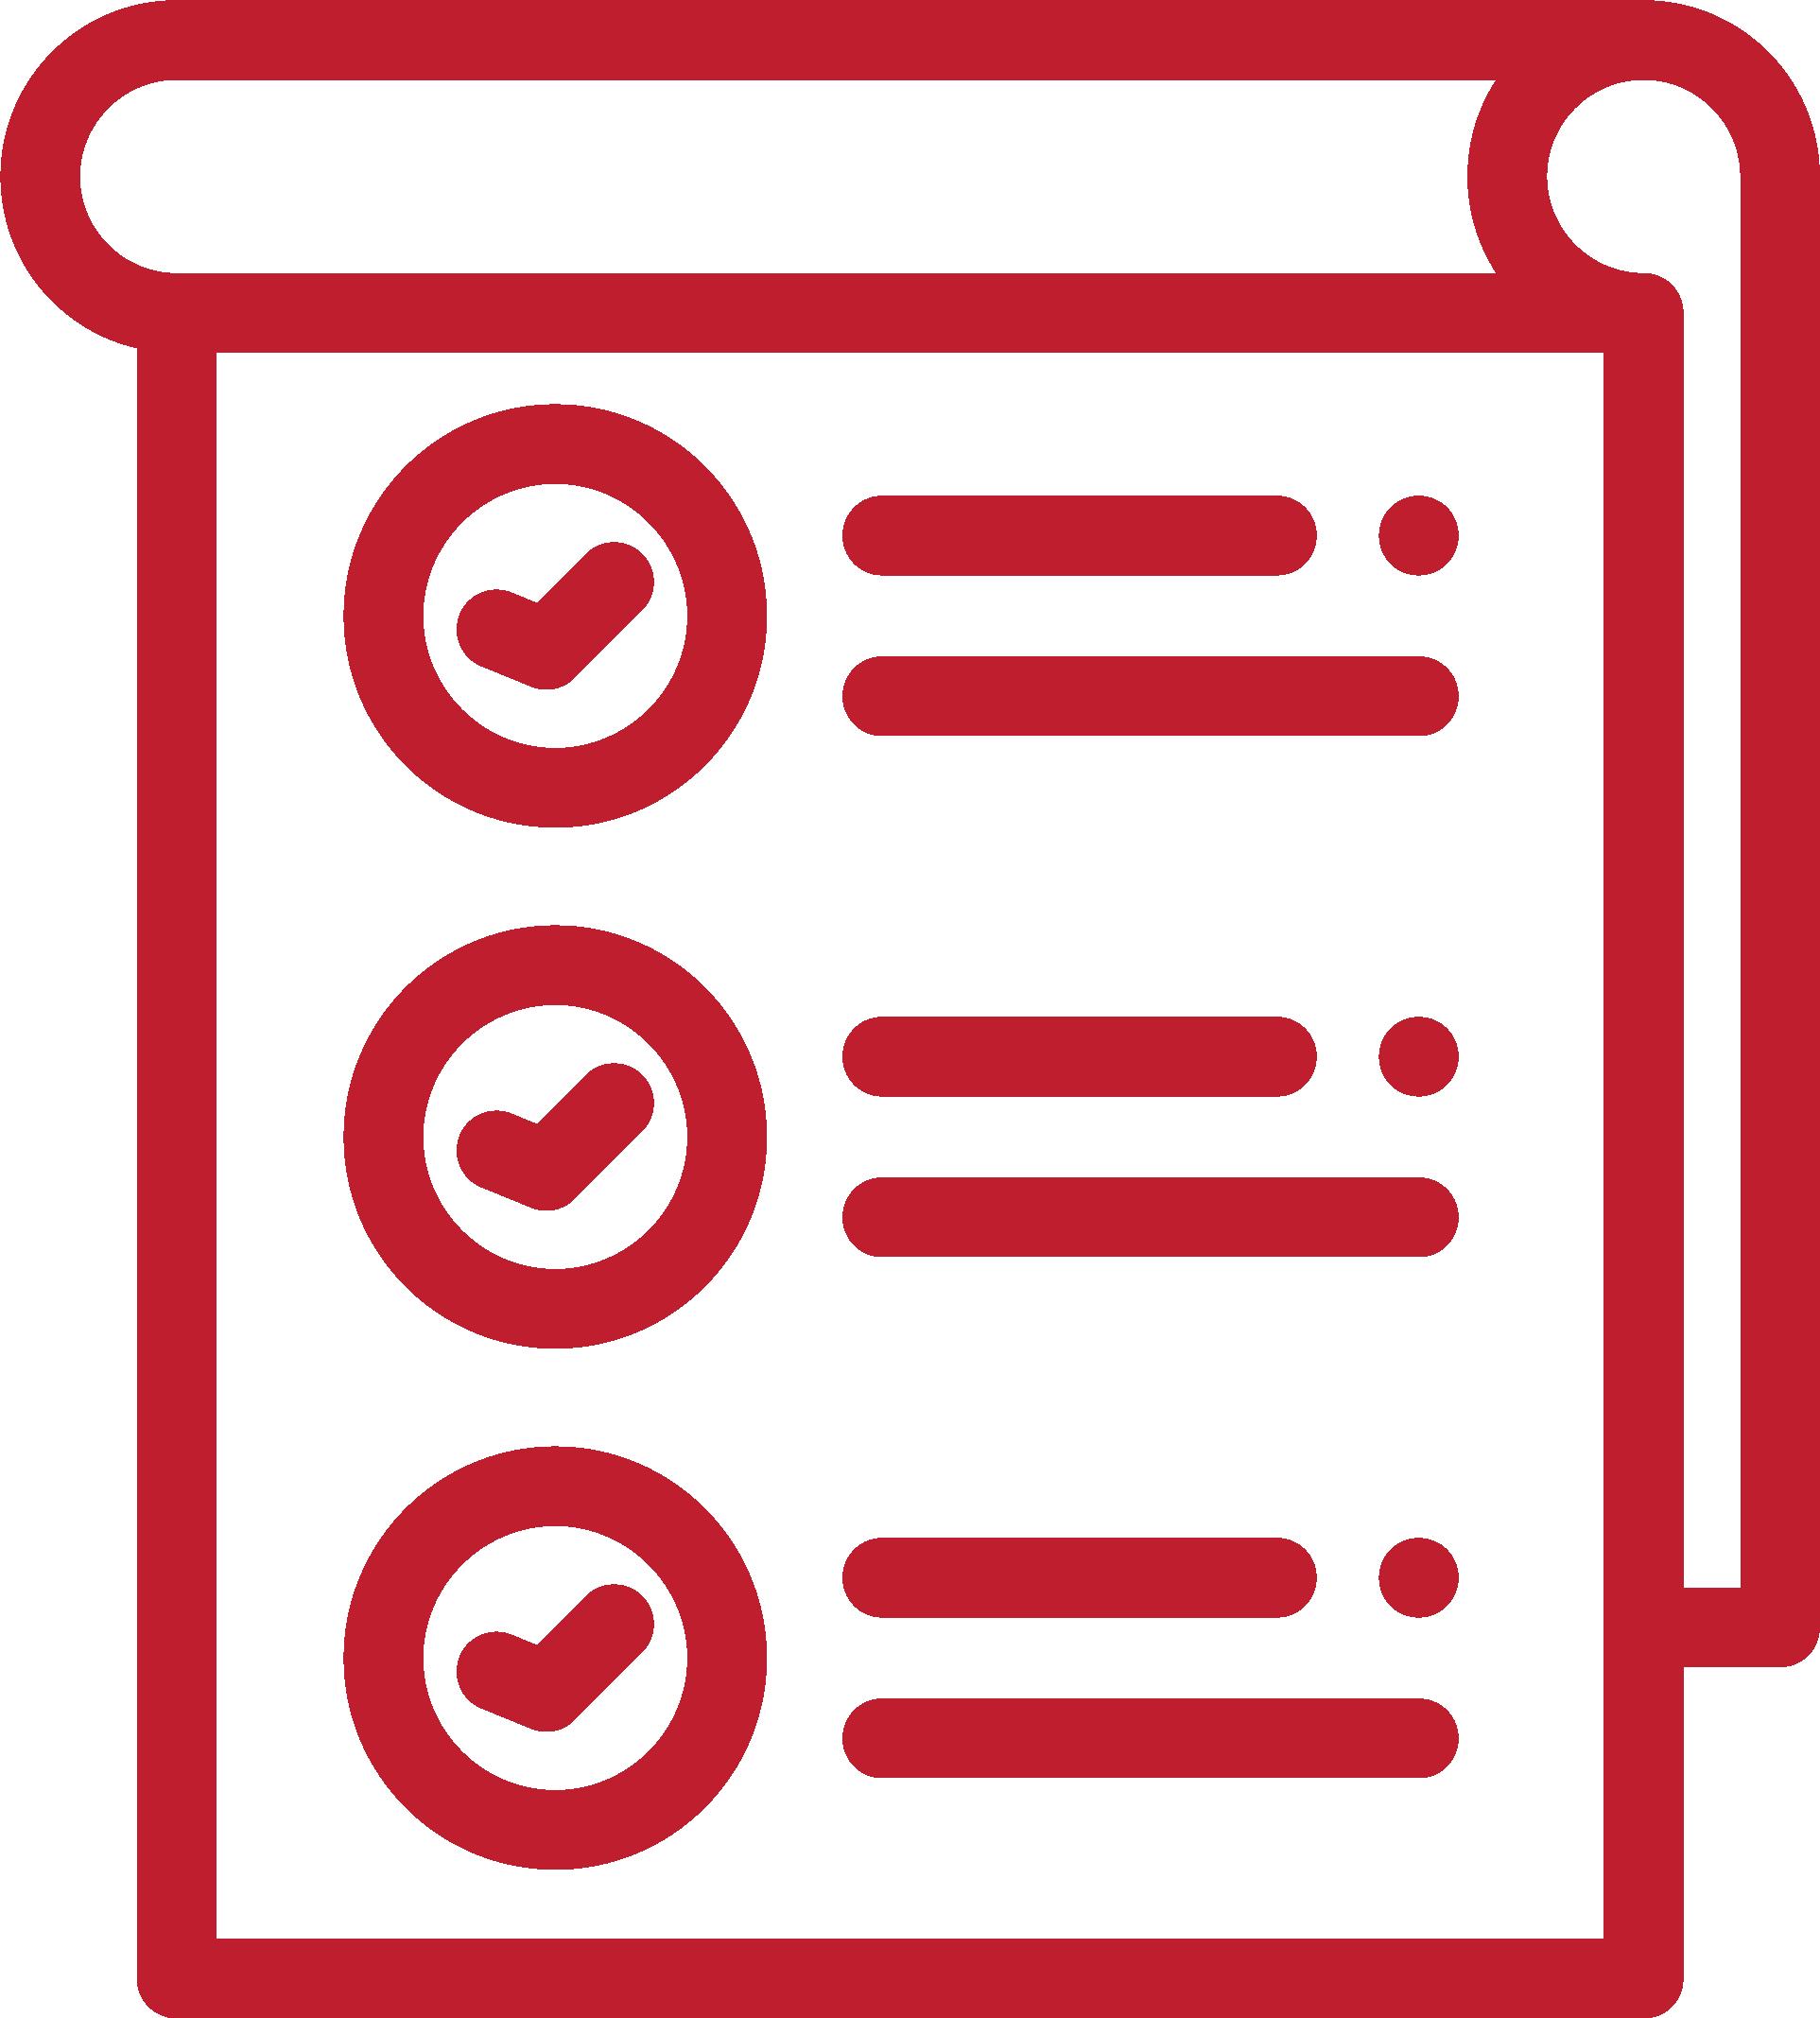 KIA Genuine Parts Compliance